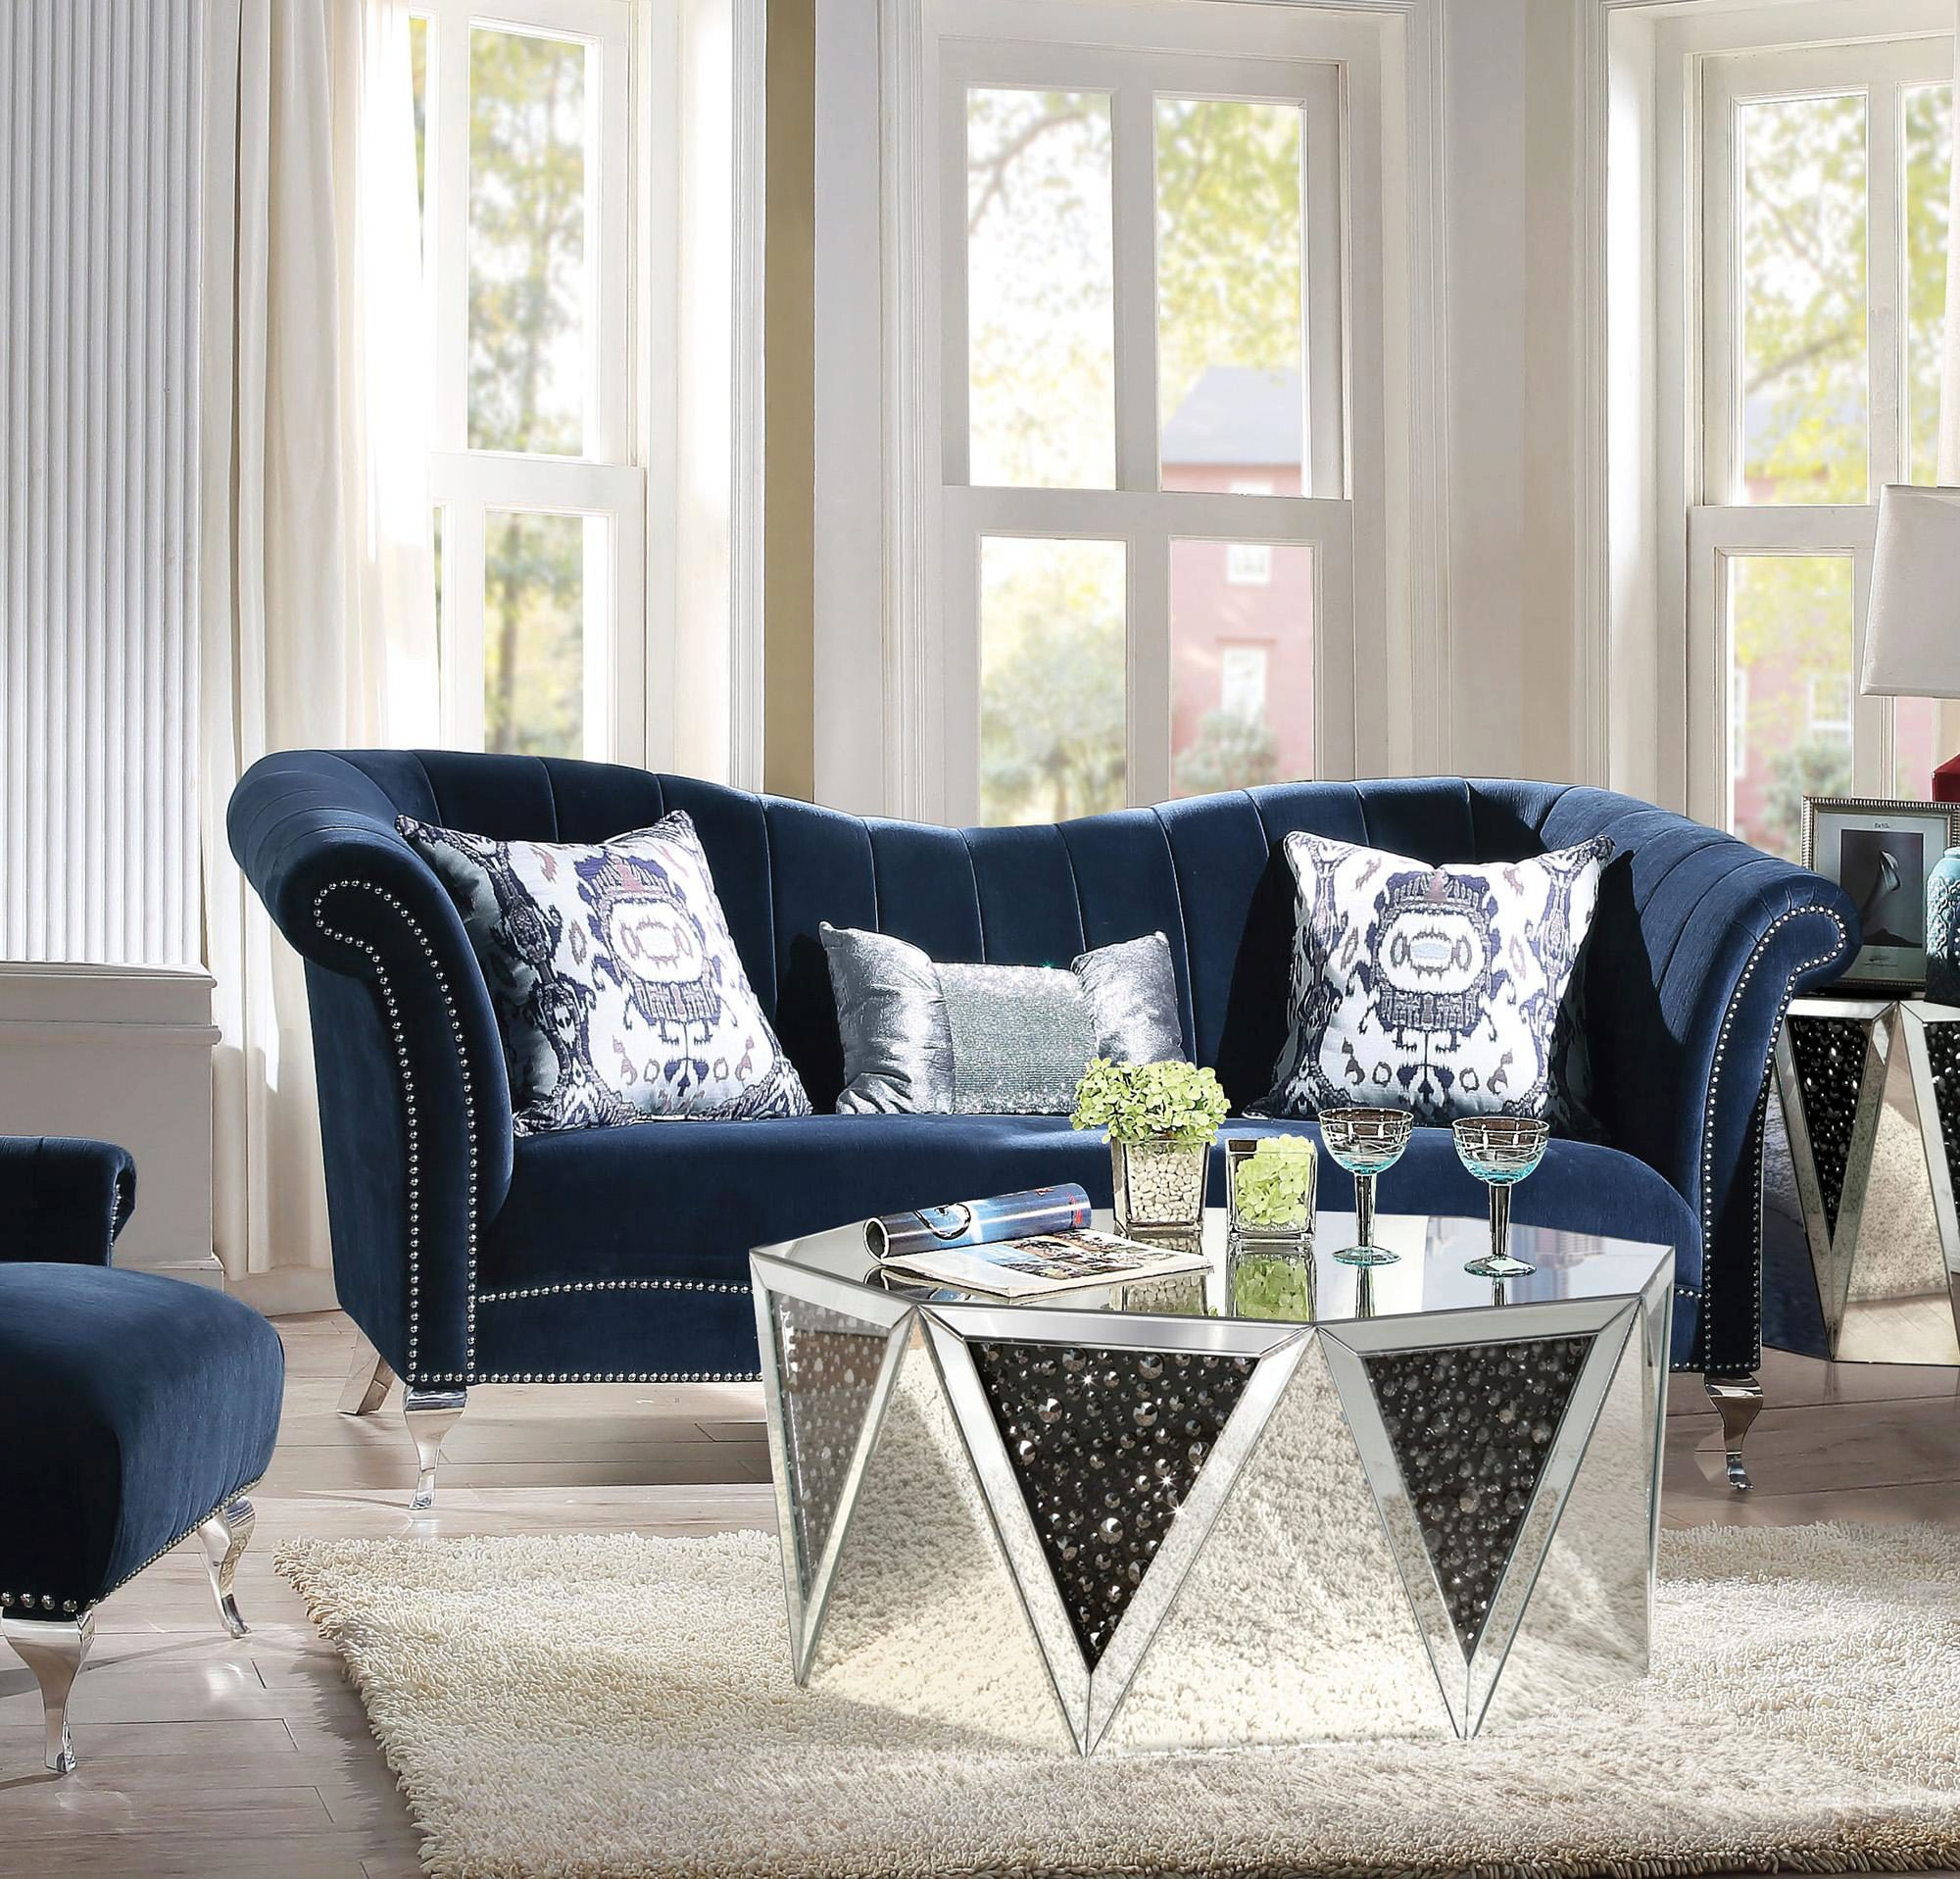 Glam Blue Velvet Sofa W Pillows Vintage Traditional Jaborosa 50345 Acme Jaborosa 50345 Sofa